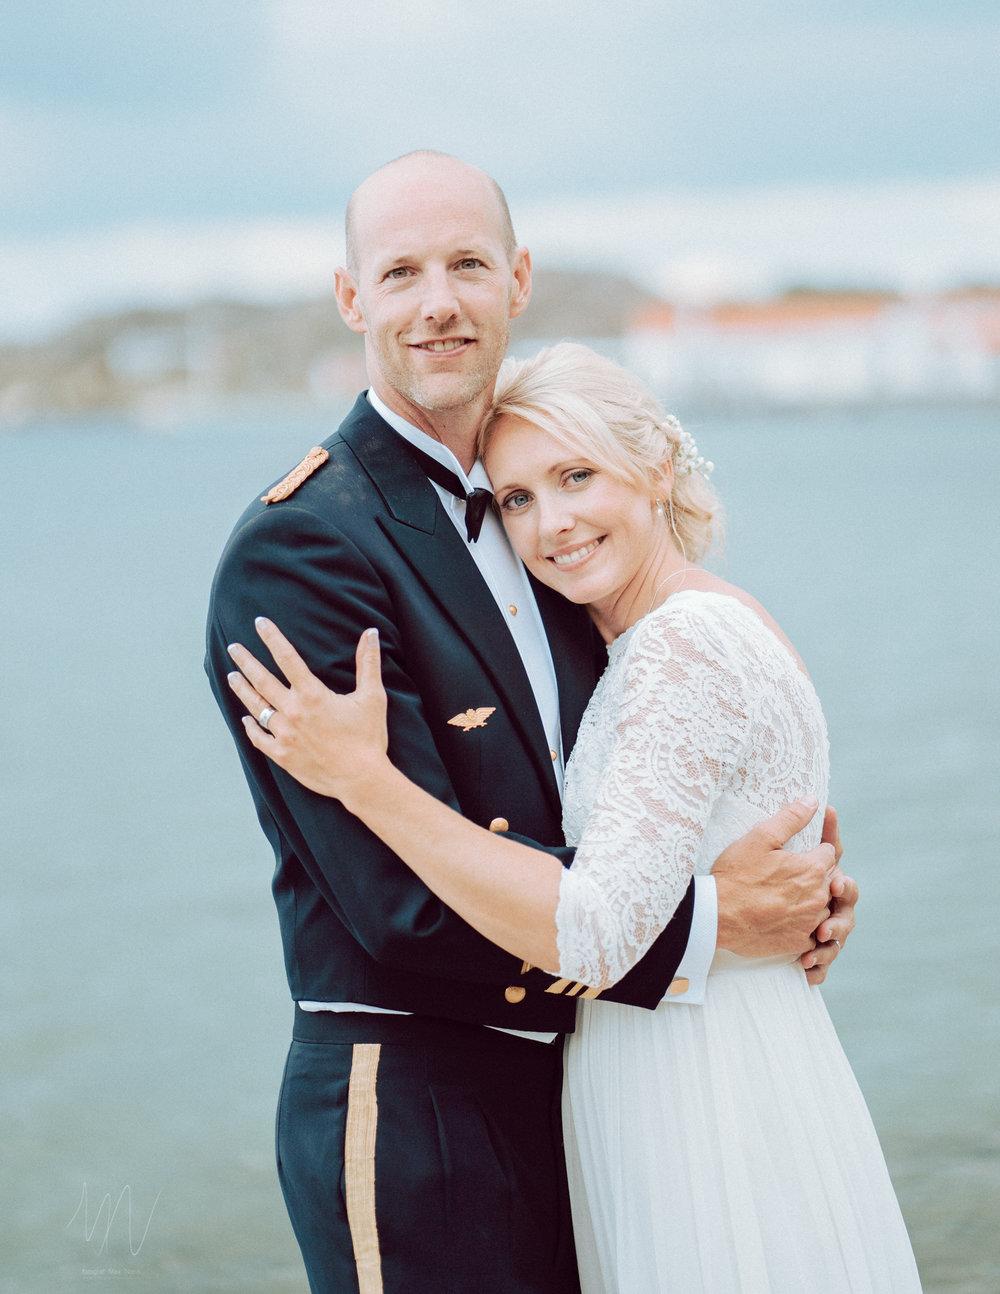 Bröllop-fotografmaxnorin.se-MariaMarcus-379.JPG